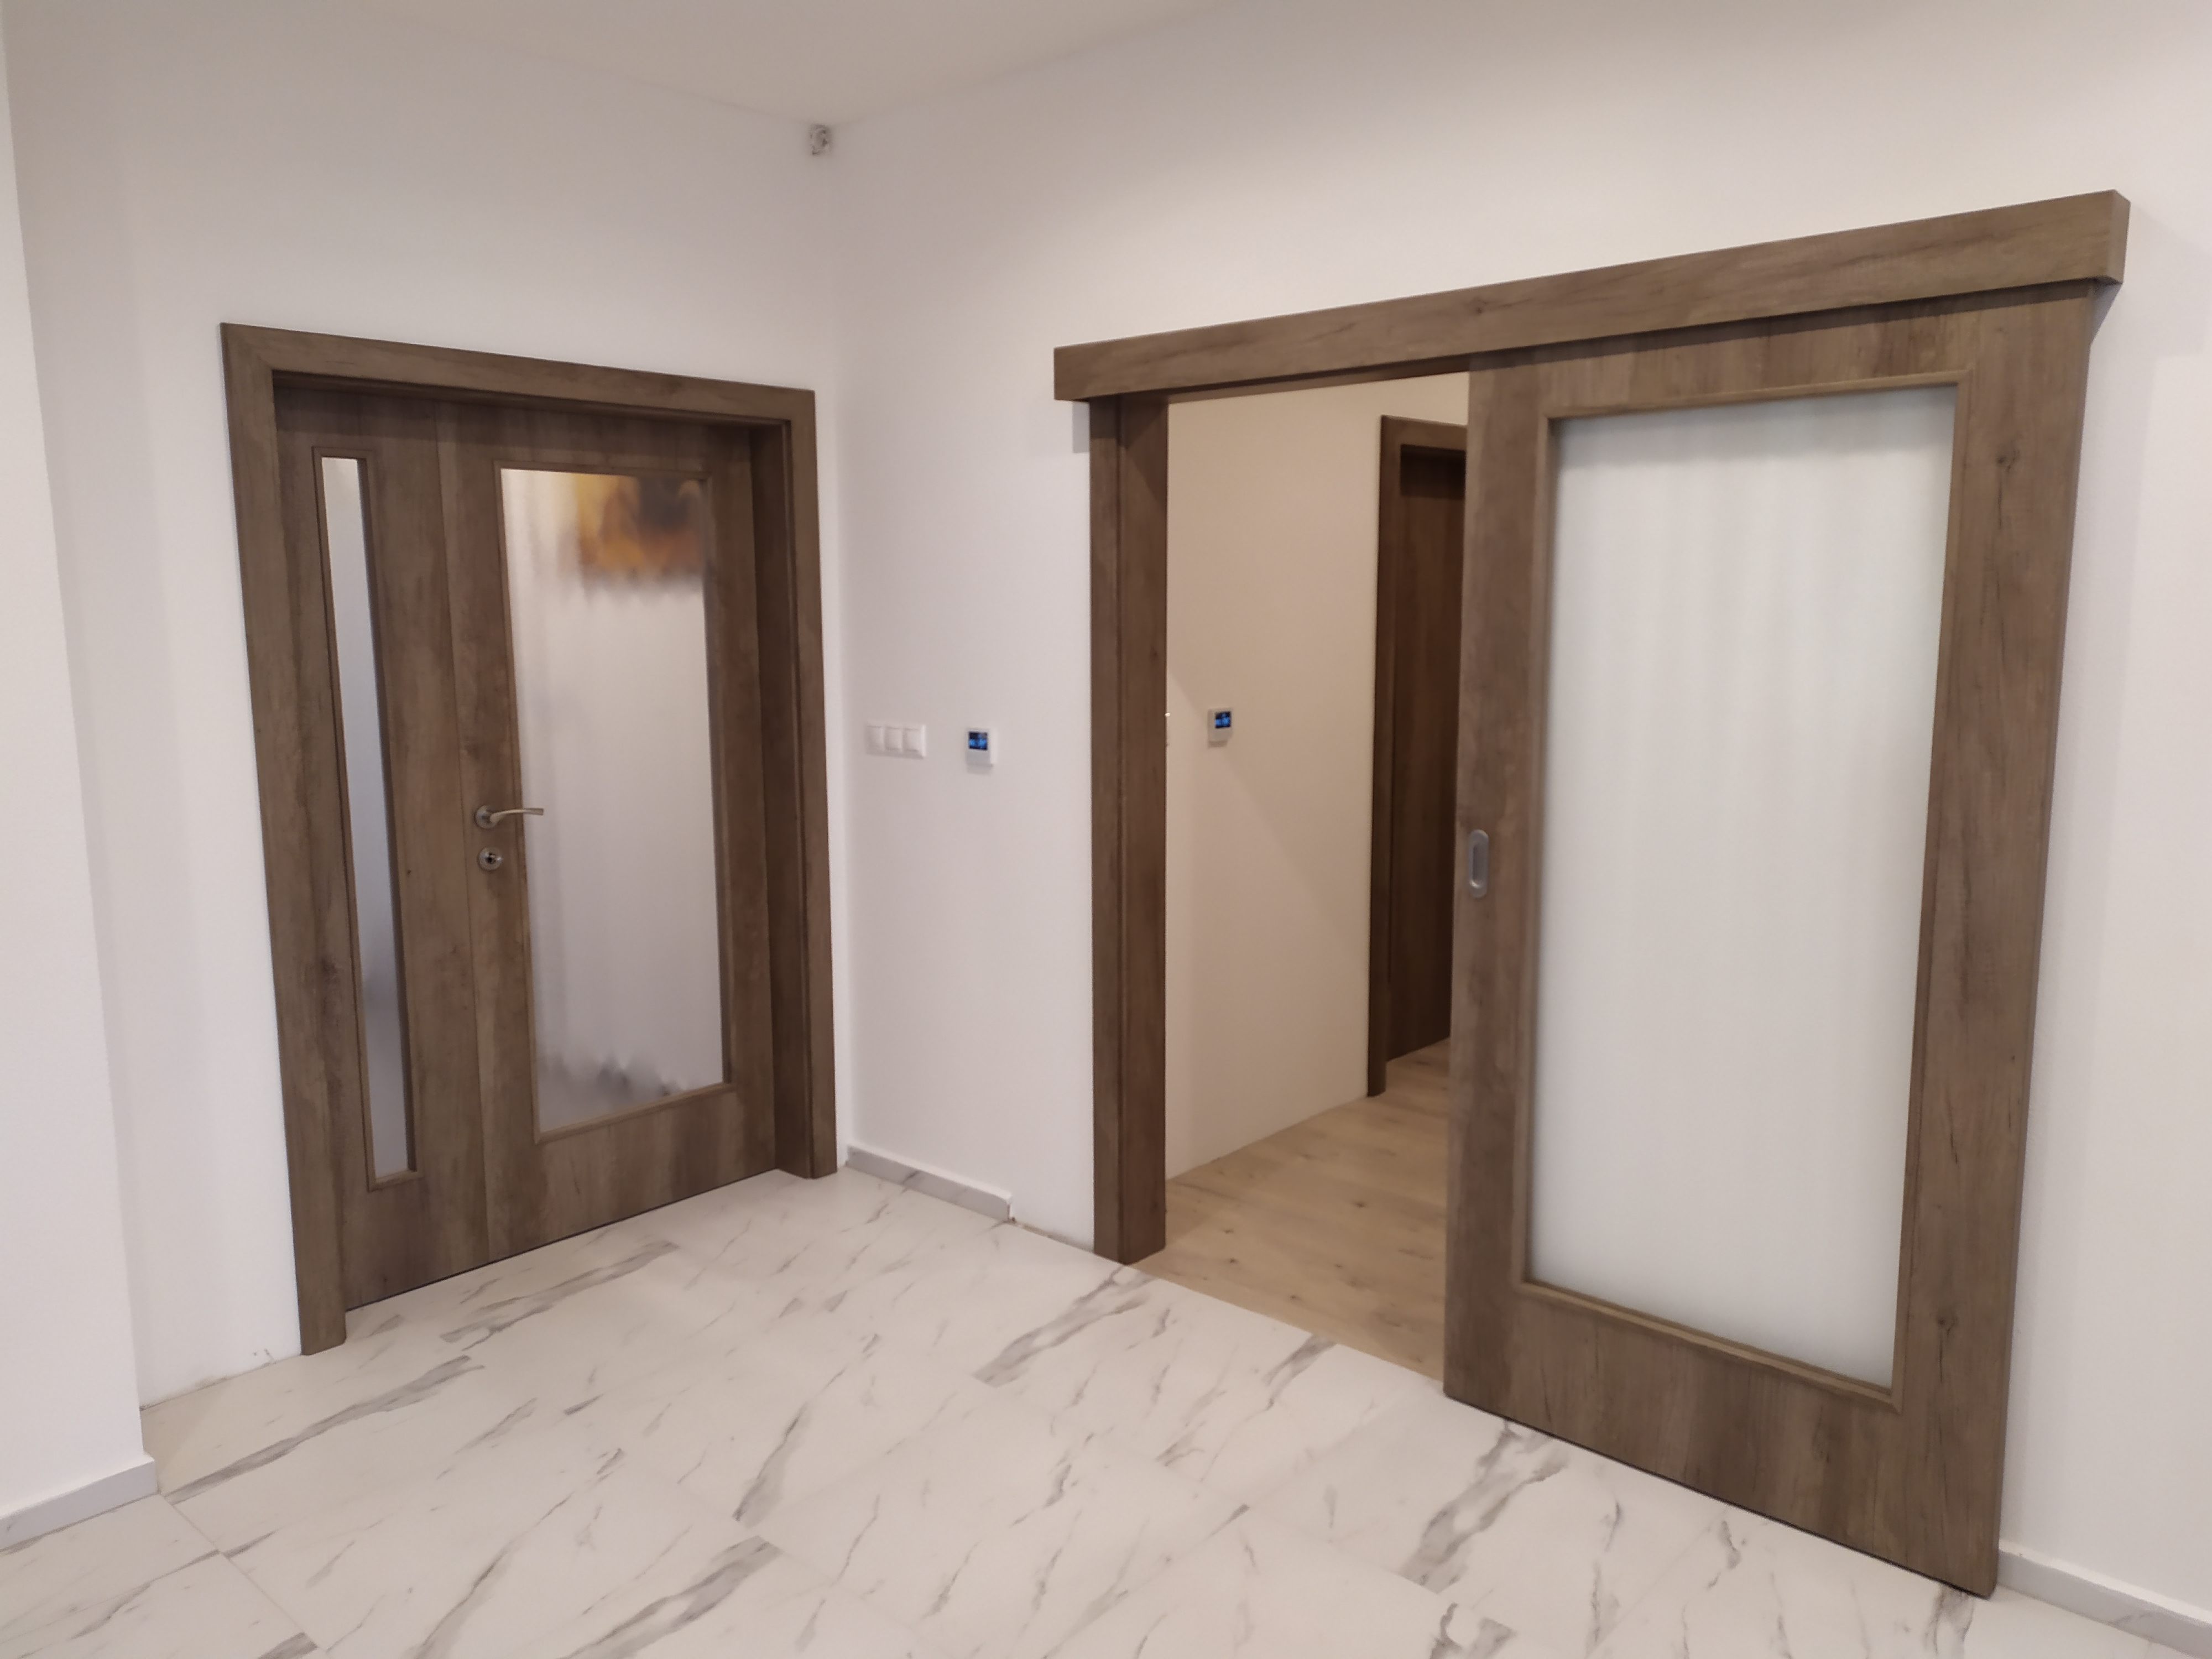 montaz dveri so sklom a posuvne dvere